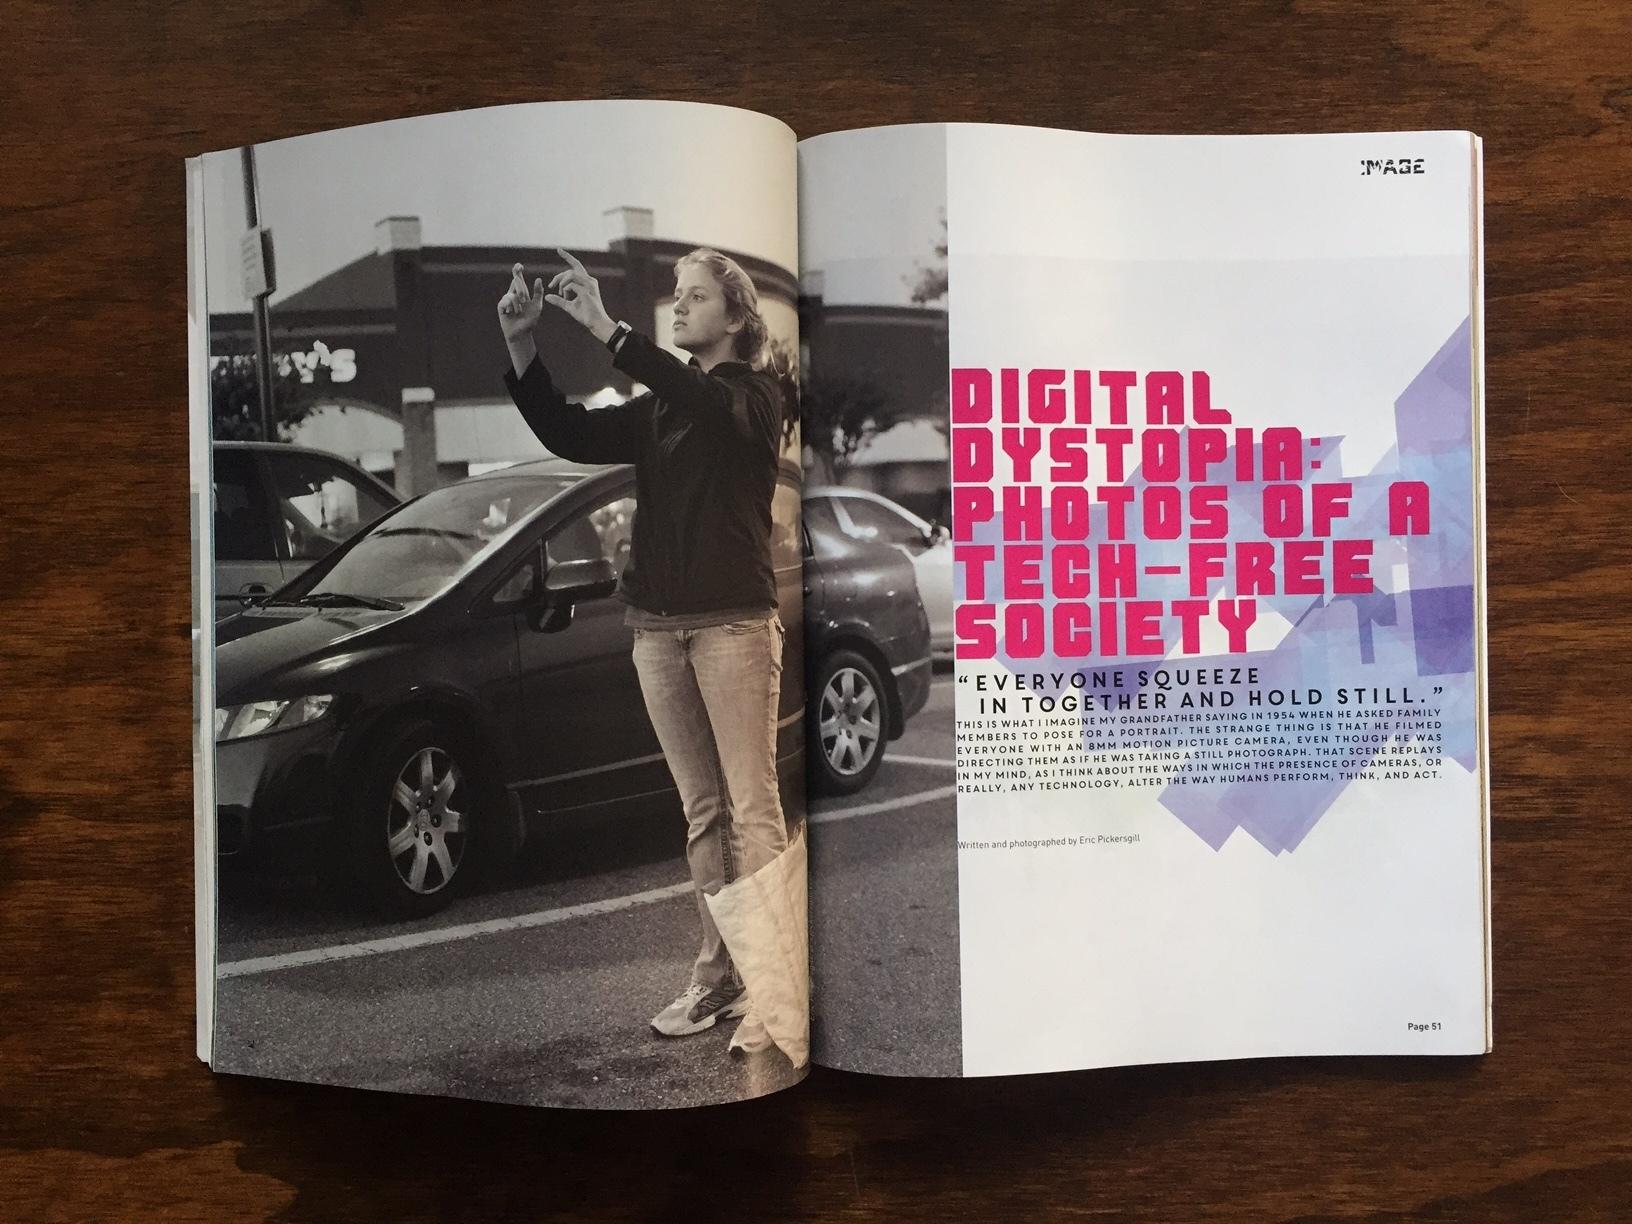 eric-pickersgill-resource-magazine-social-meida-issue-1.JPG